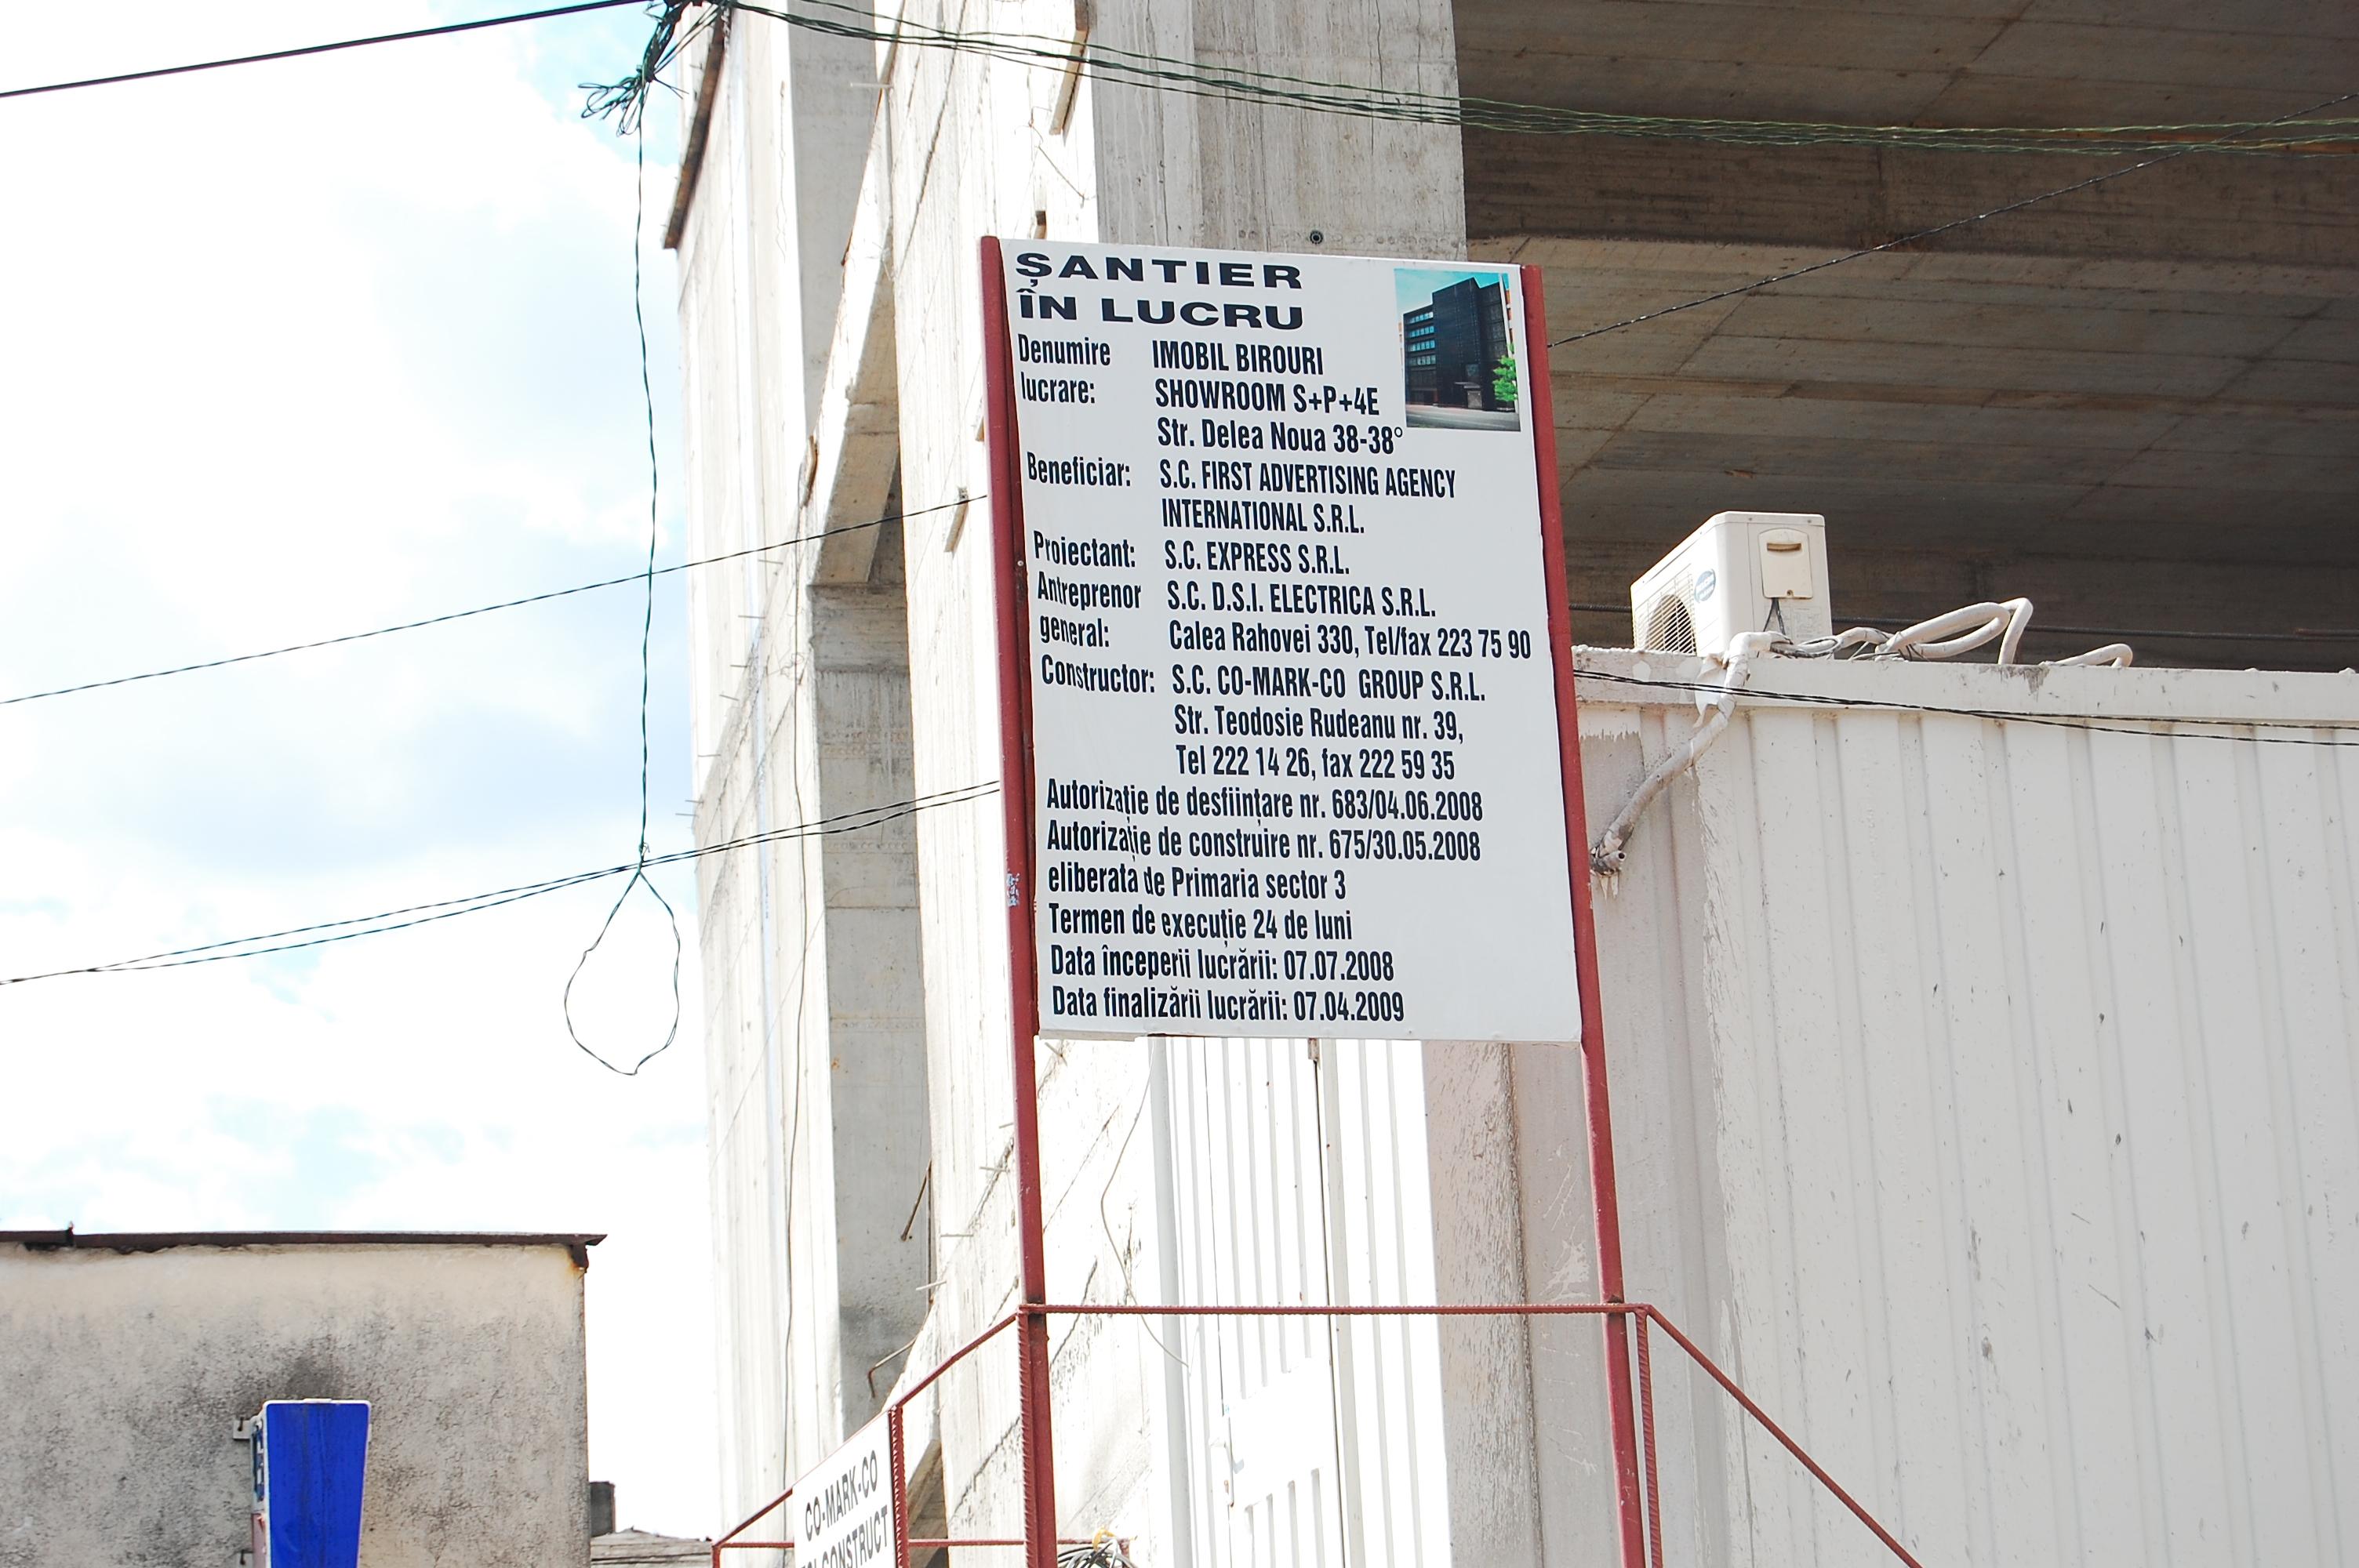 Aditiv in beton - Co-MARK-Co Group - Delea Noua UNICO PROFIT - Poza 13